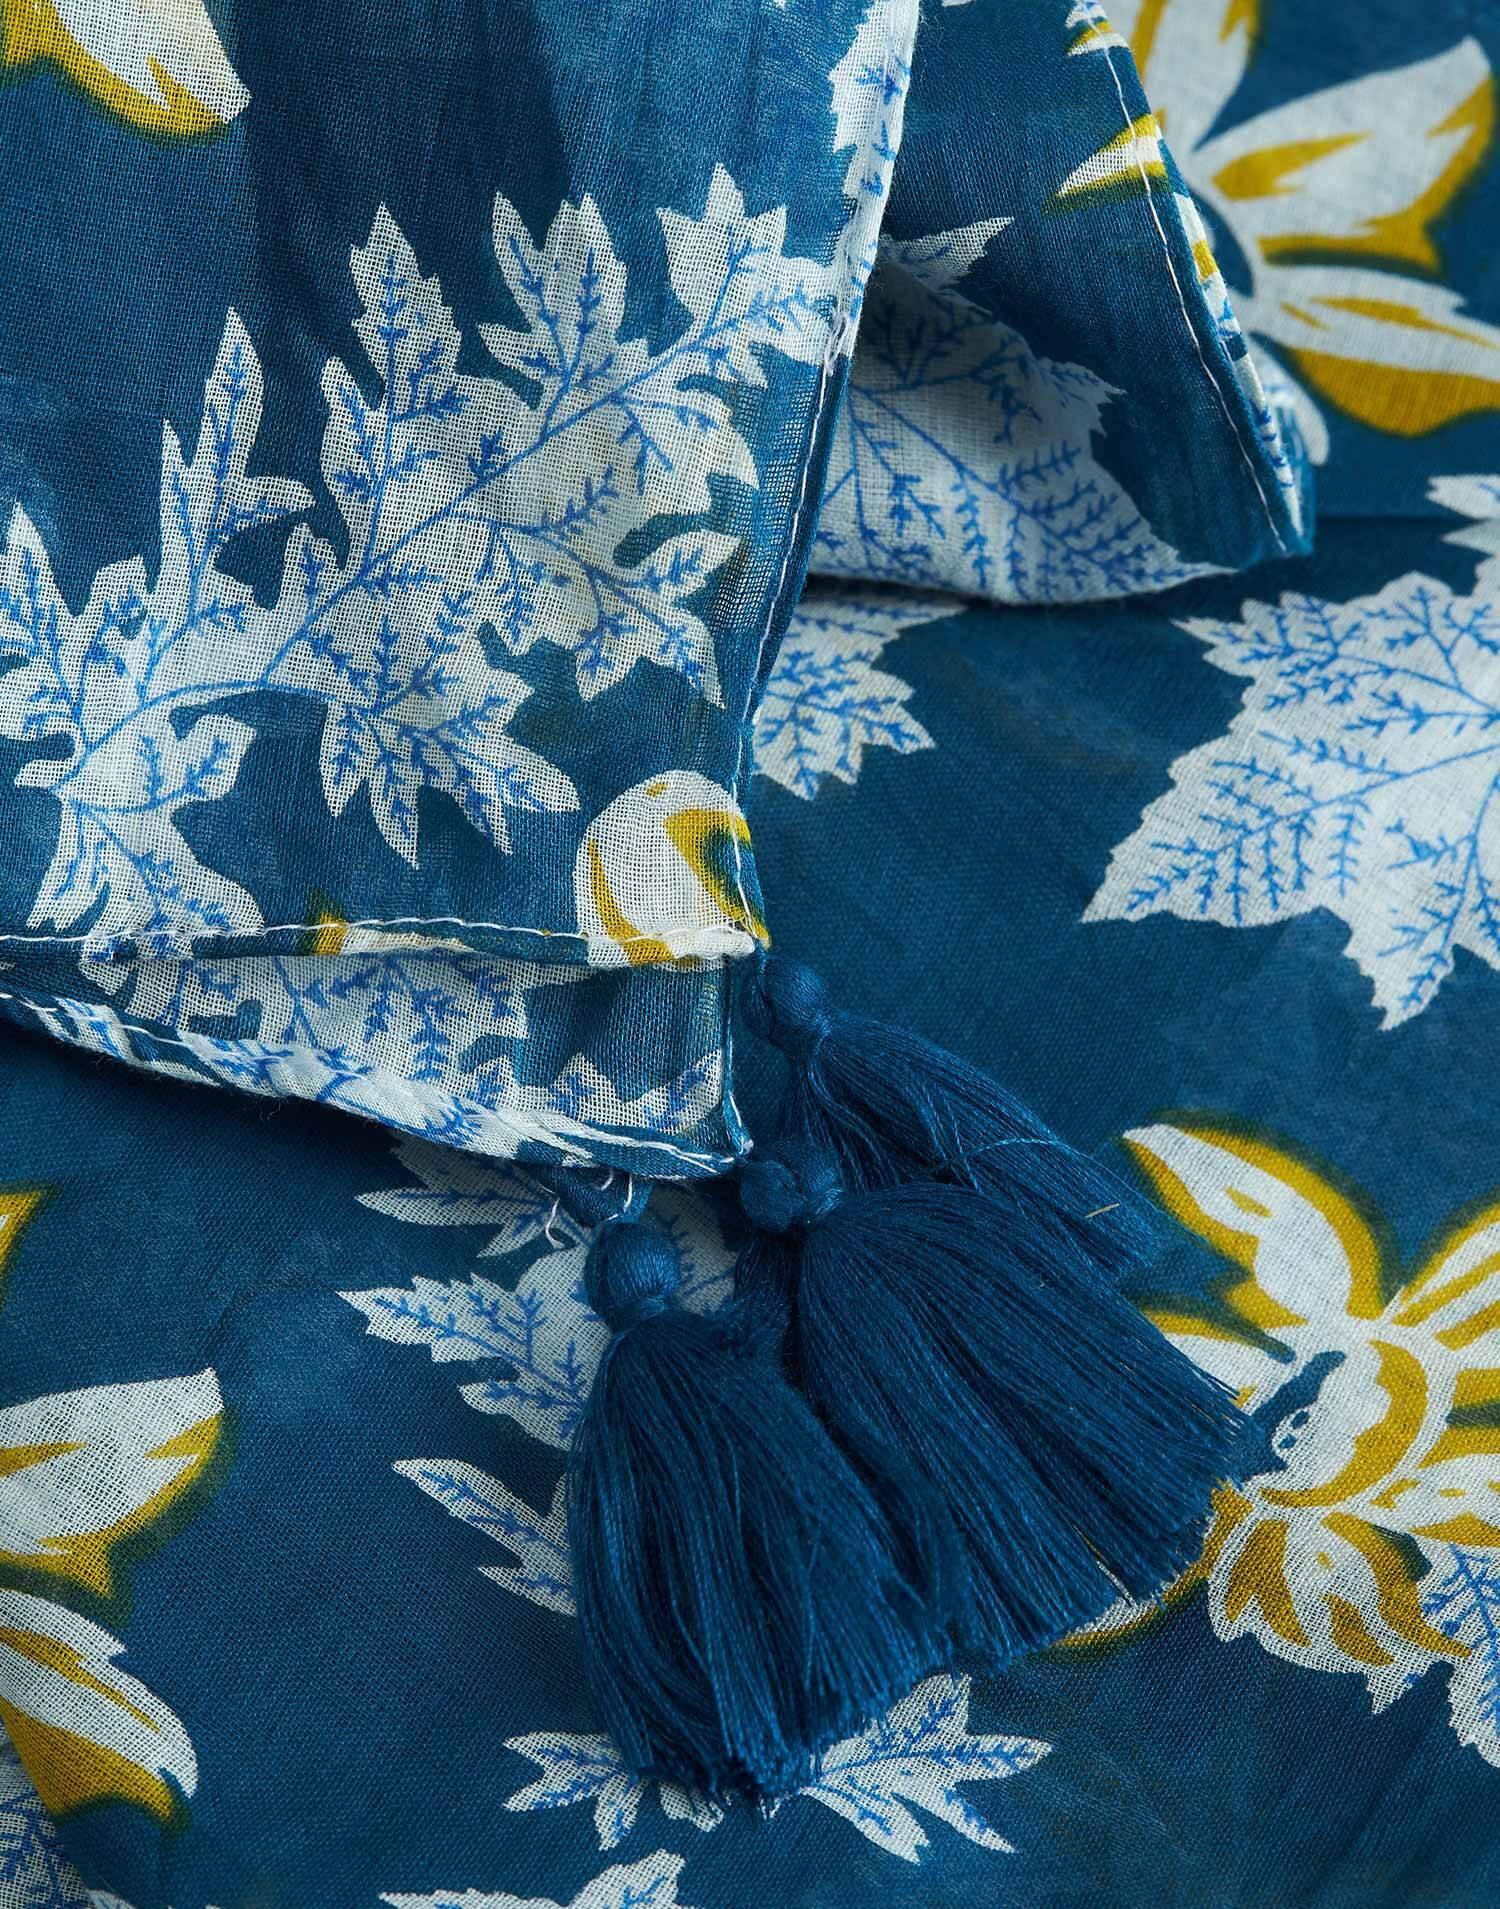 Fular print hojas pompones